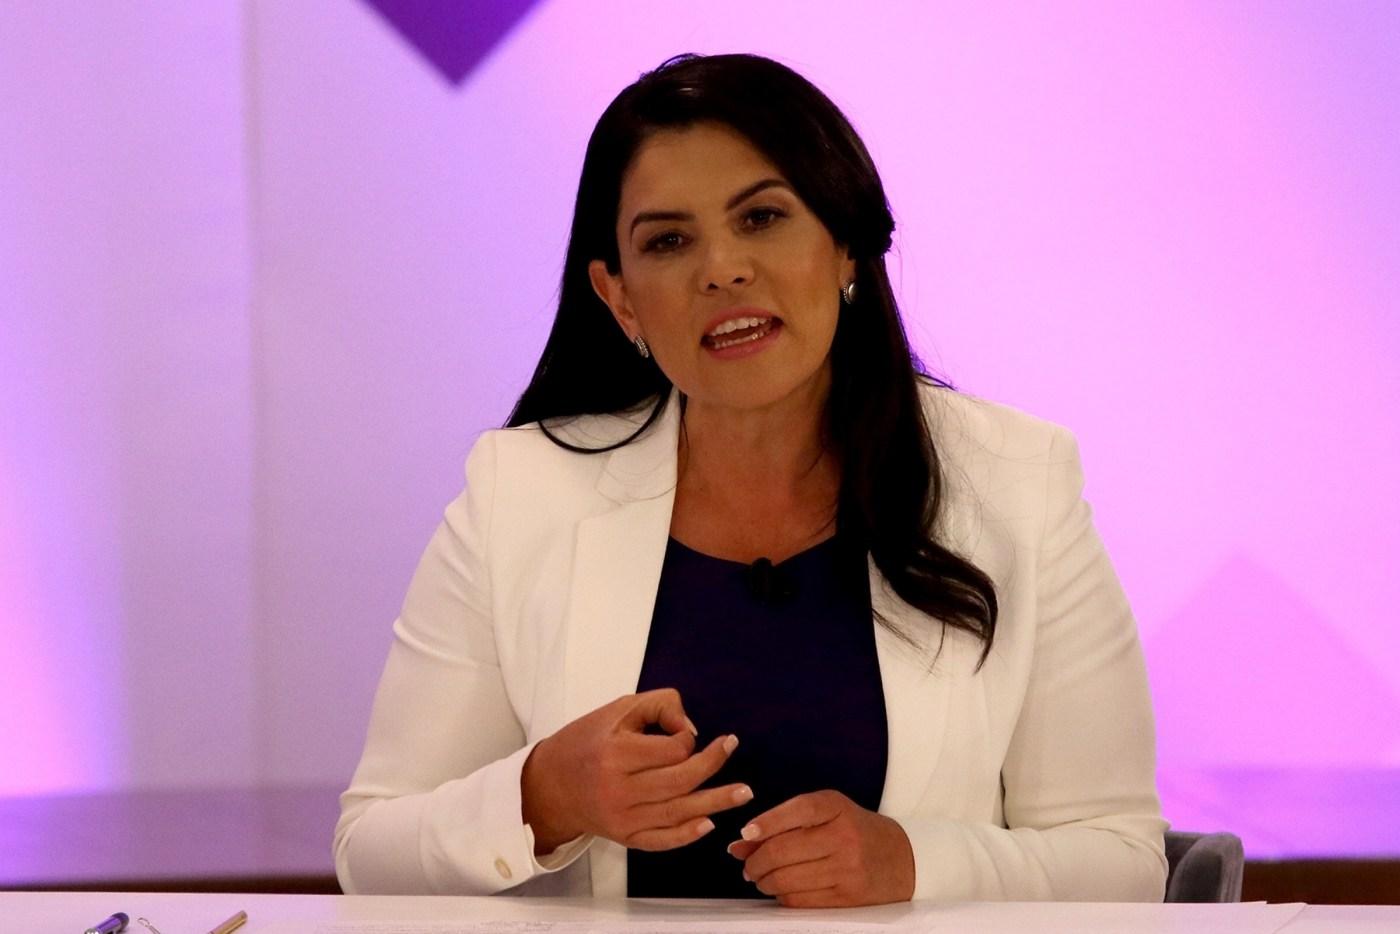 Teresa Castell, candidata Independiente a la gubernatura del Estado de México. (Notimex)